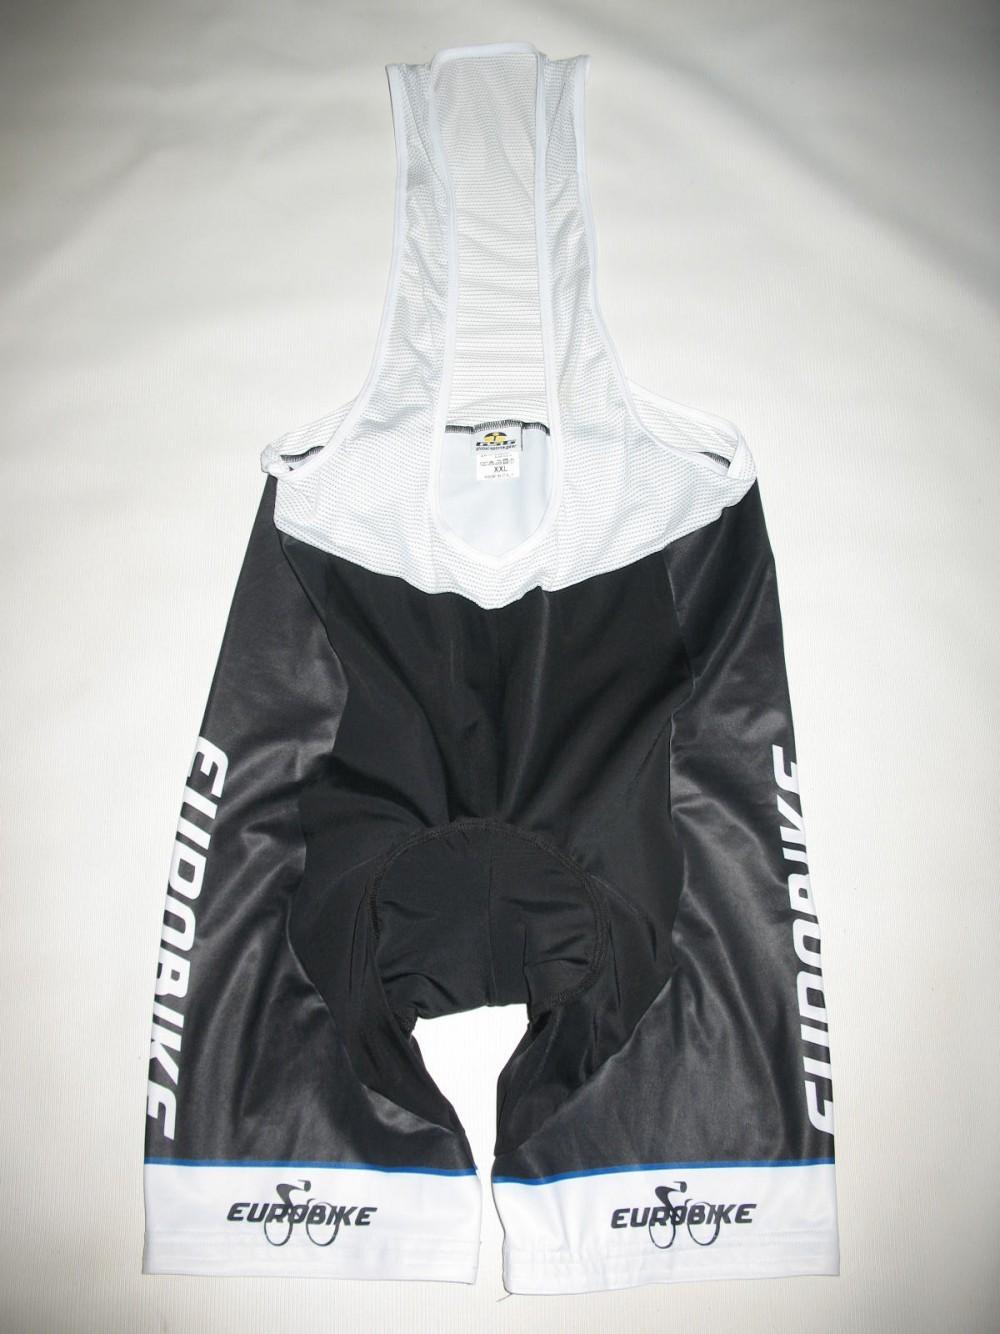 Велошорты GSG eurobike cycling bib shorts (размер XXL) - 1